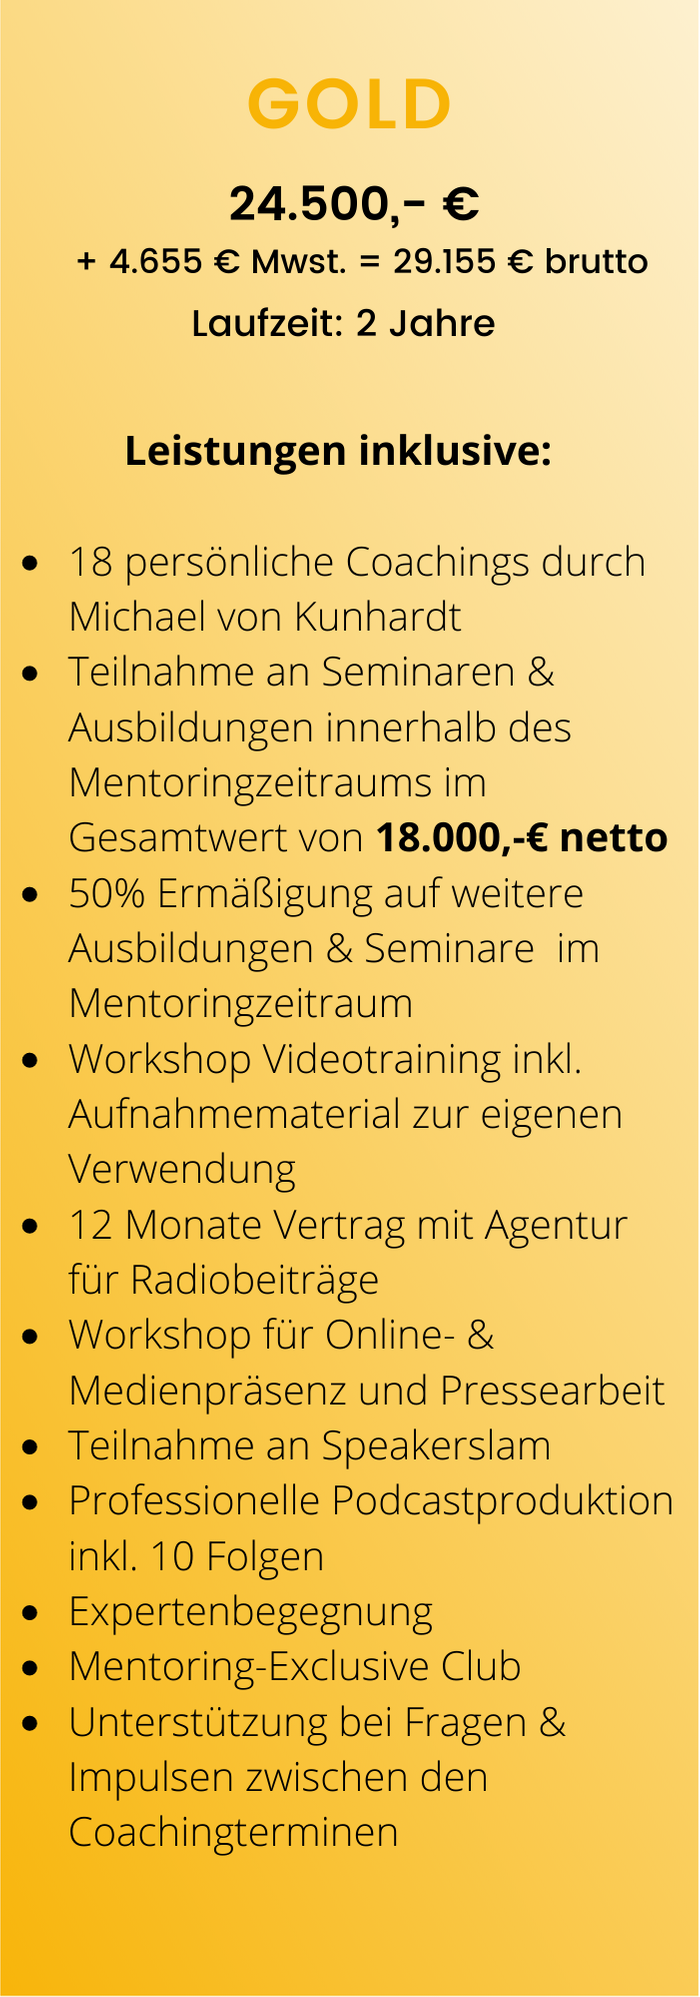 https://www.vonkunhardt.de/wp-content/uploads/2021/02/Gold-700x1997.png